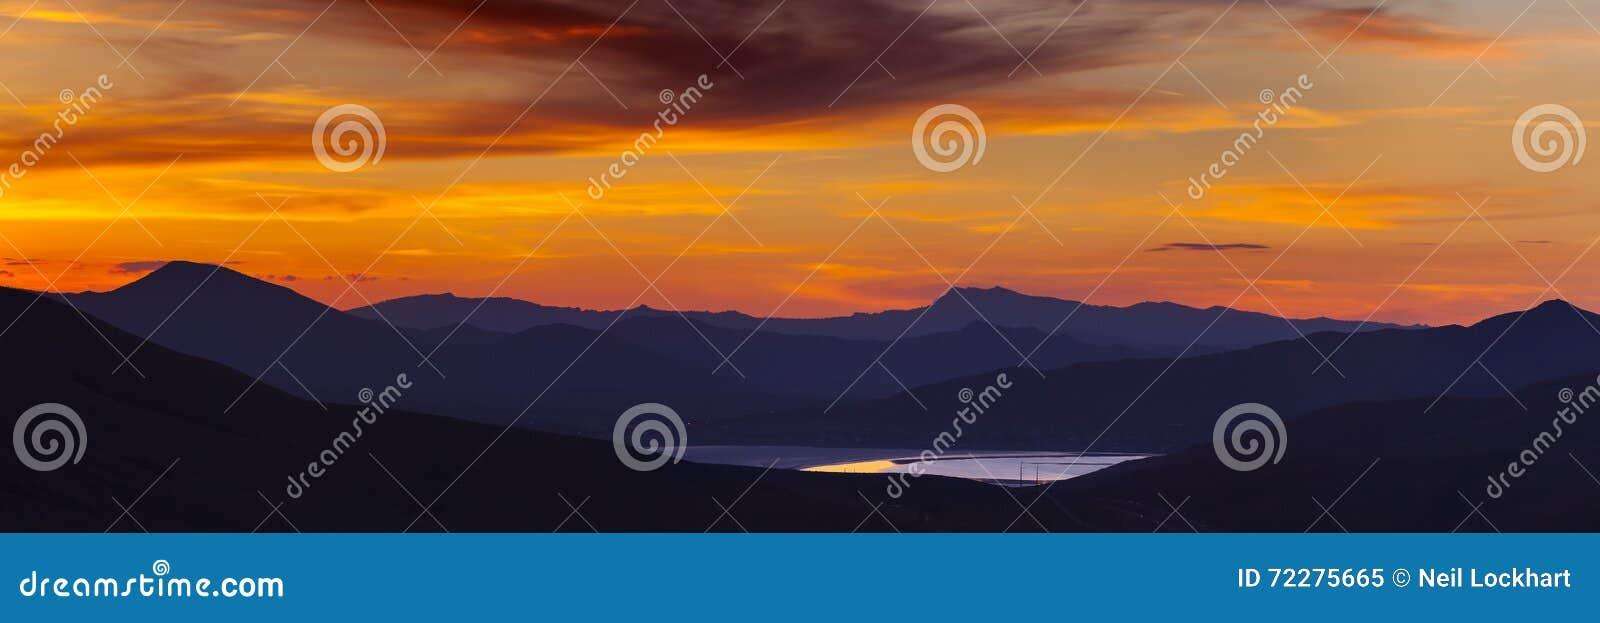 Download Заход солнца на холодных веснах, Невада Стоковое Изображение - изображение насчитывающей подъем, небеса: 72275665